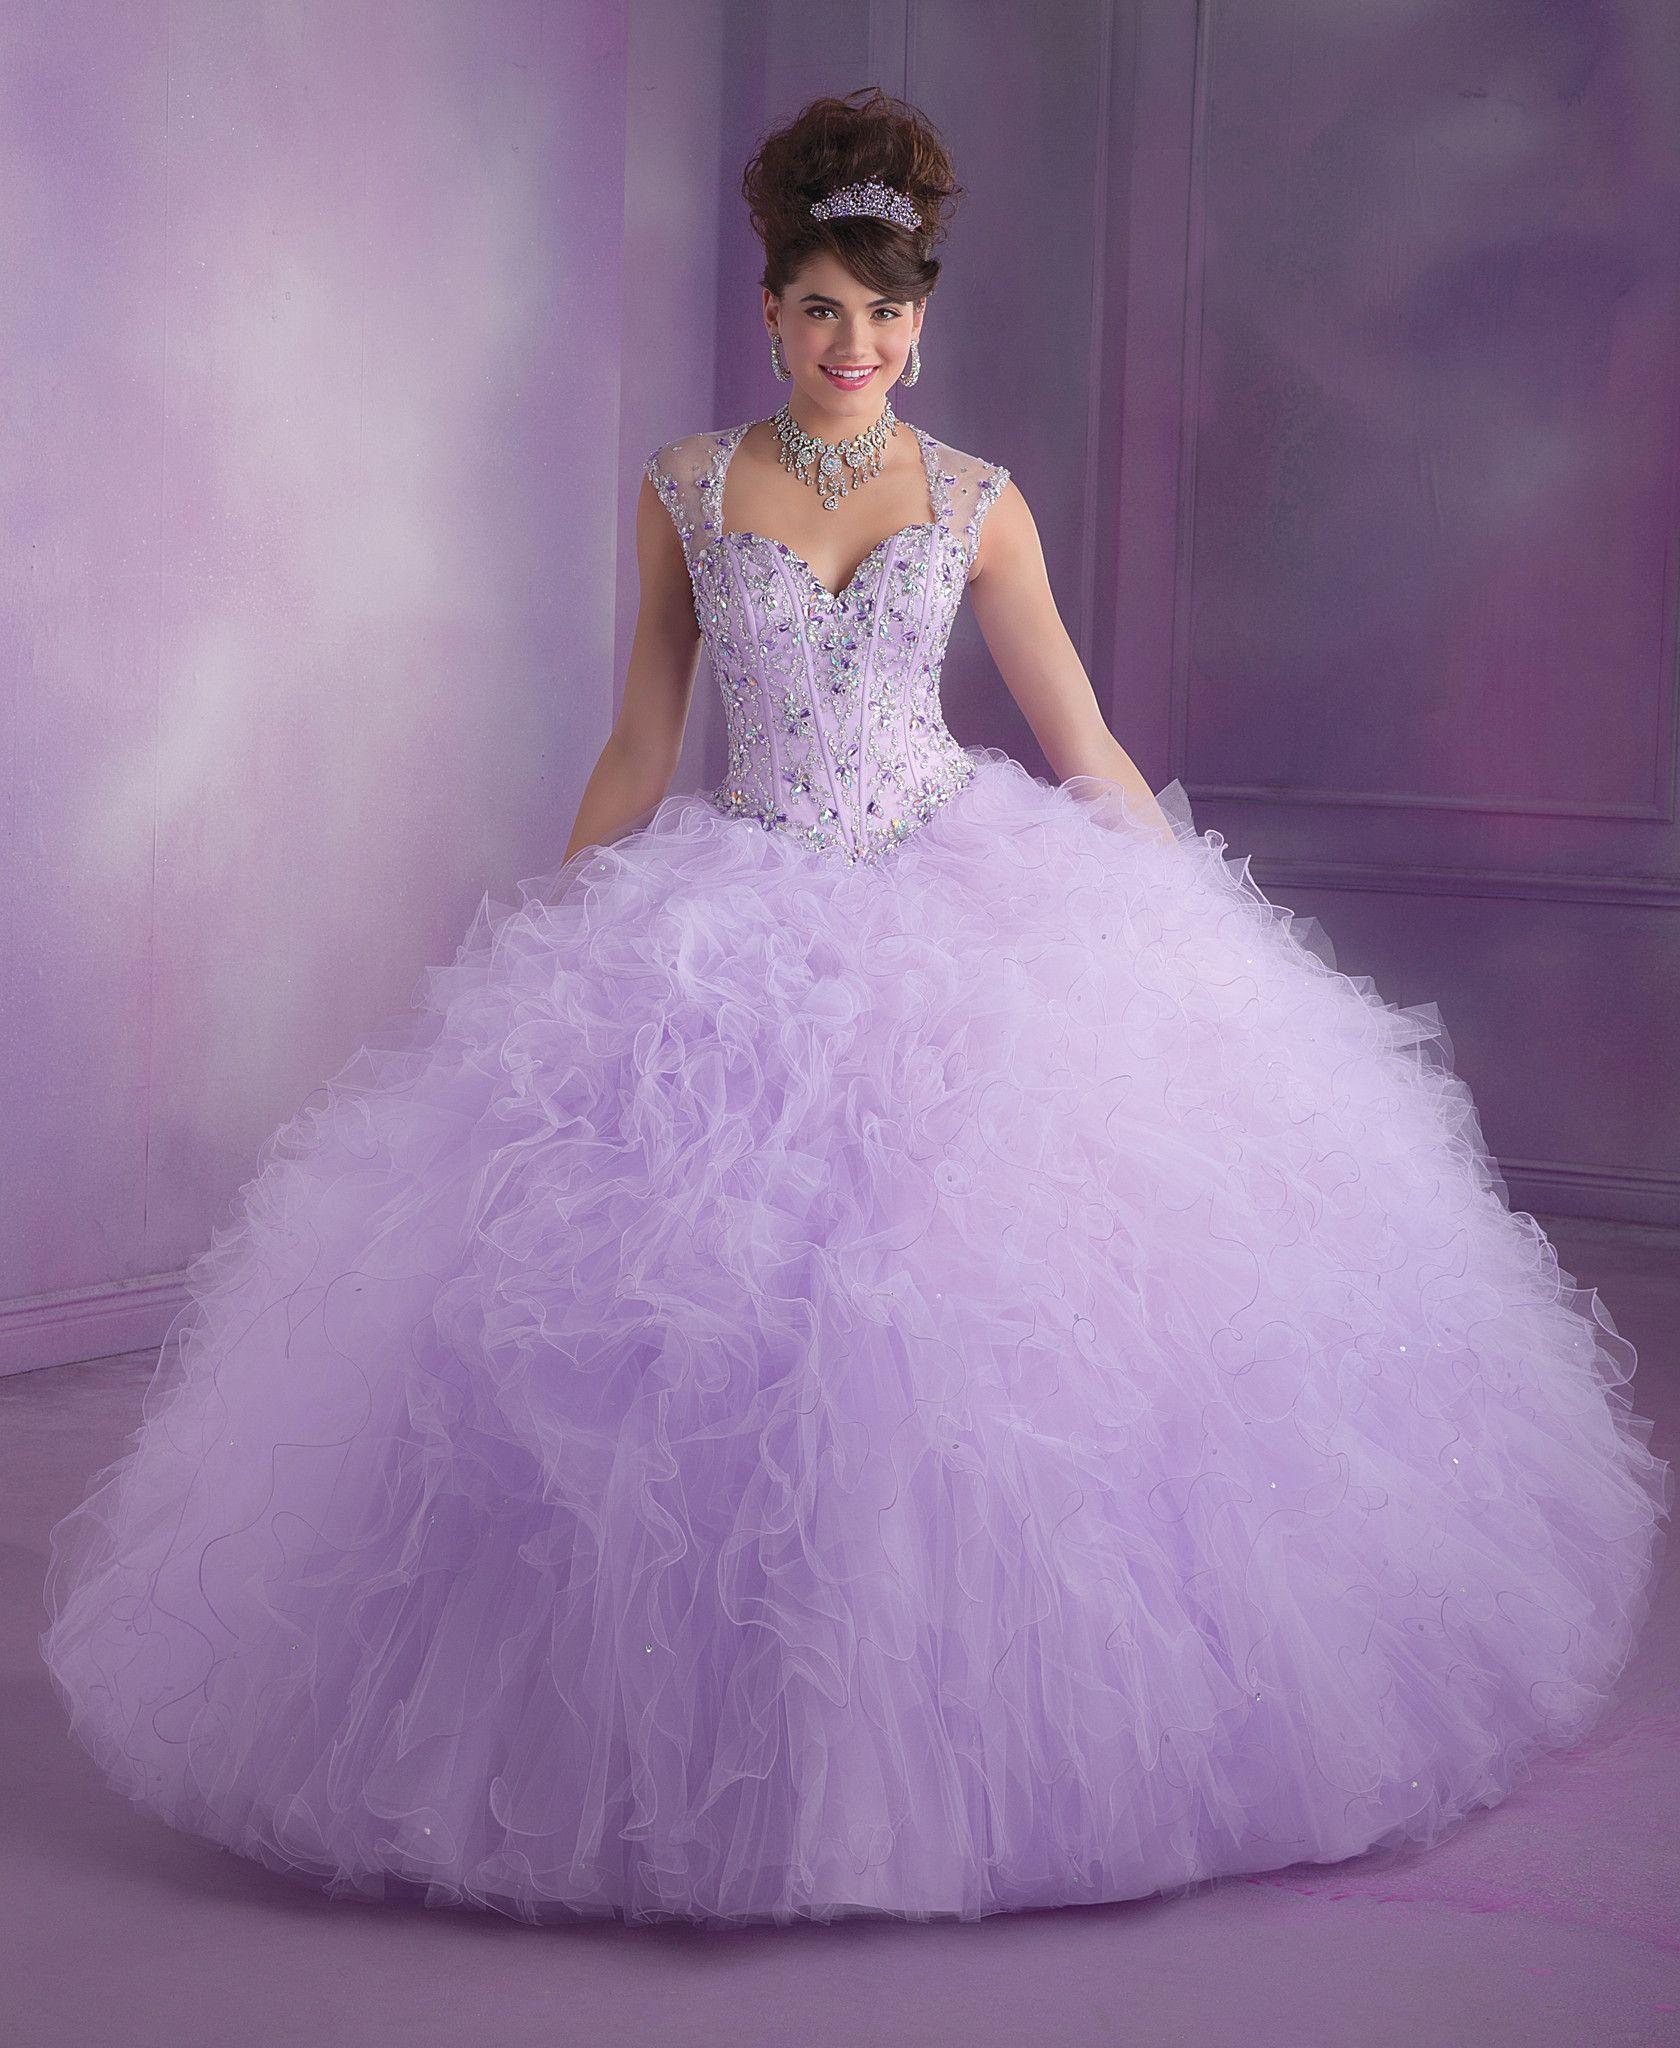 Mori Lee Quinceanera Dress Style 89010